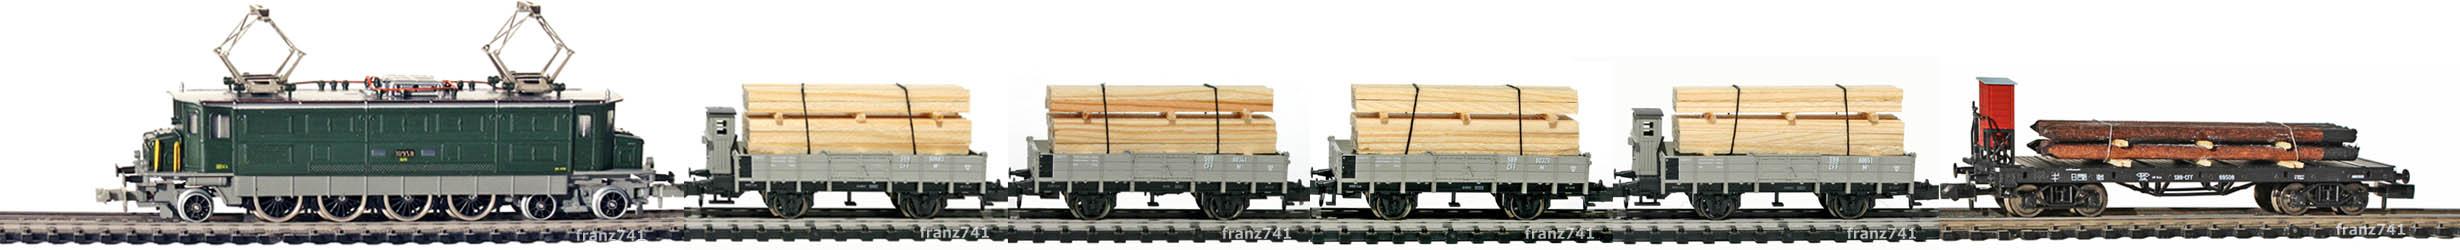 Epoche-II-III-SBB-Holz-Gueterzug_Ae-4-7-Elok-Bremserhaus-Gueterwagen